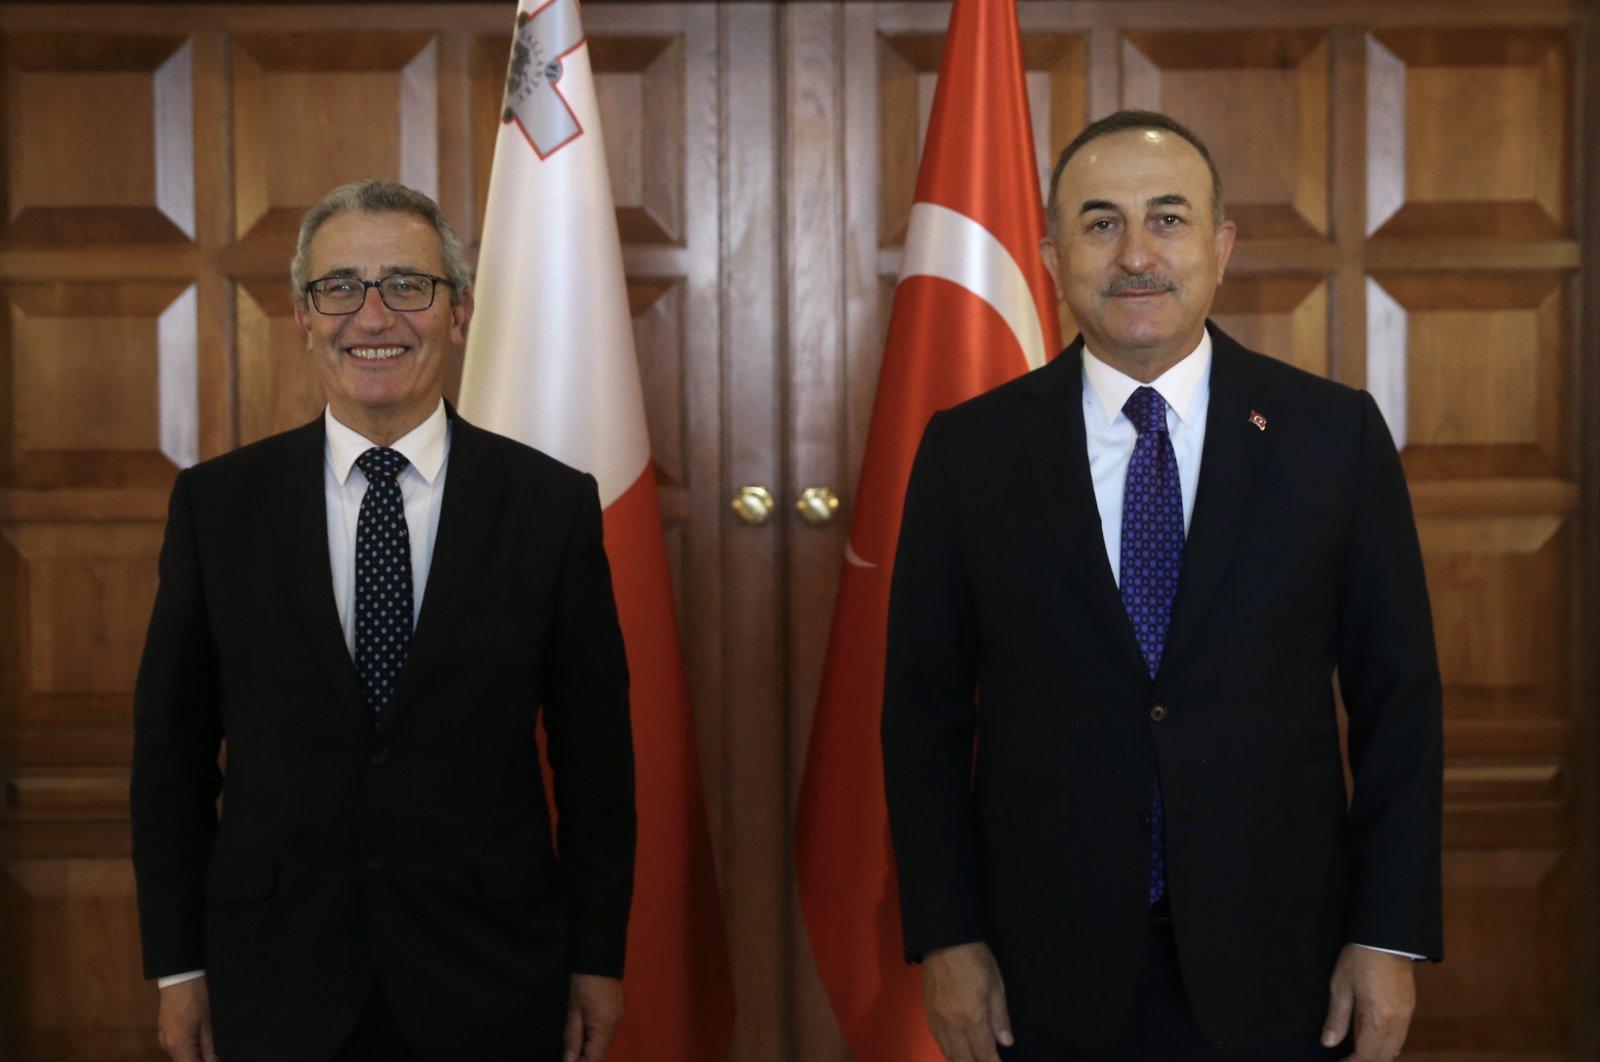 Turkish Foreign Minister Mevlüt Çavuşoğlu (R) meets with his Maltese counterpart Evarist Bartolo in the capital Ankara, Turkey, April 13, 2021. (AA Photo)